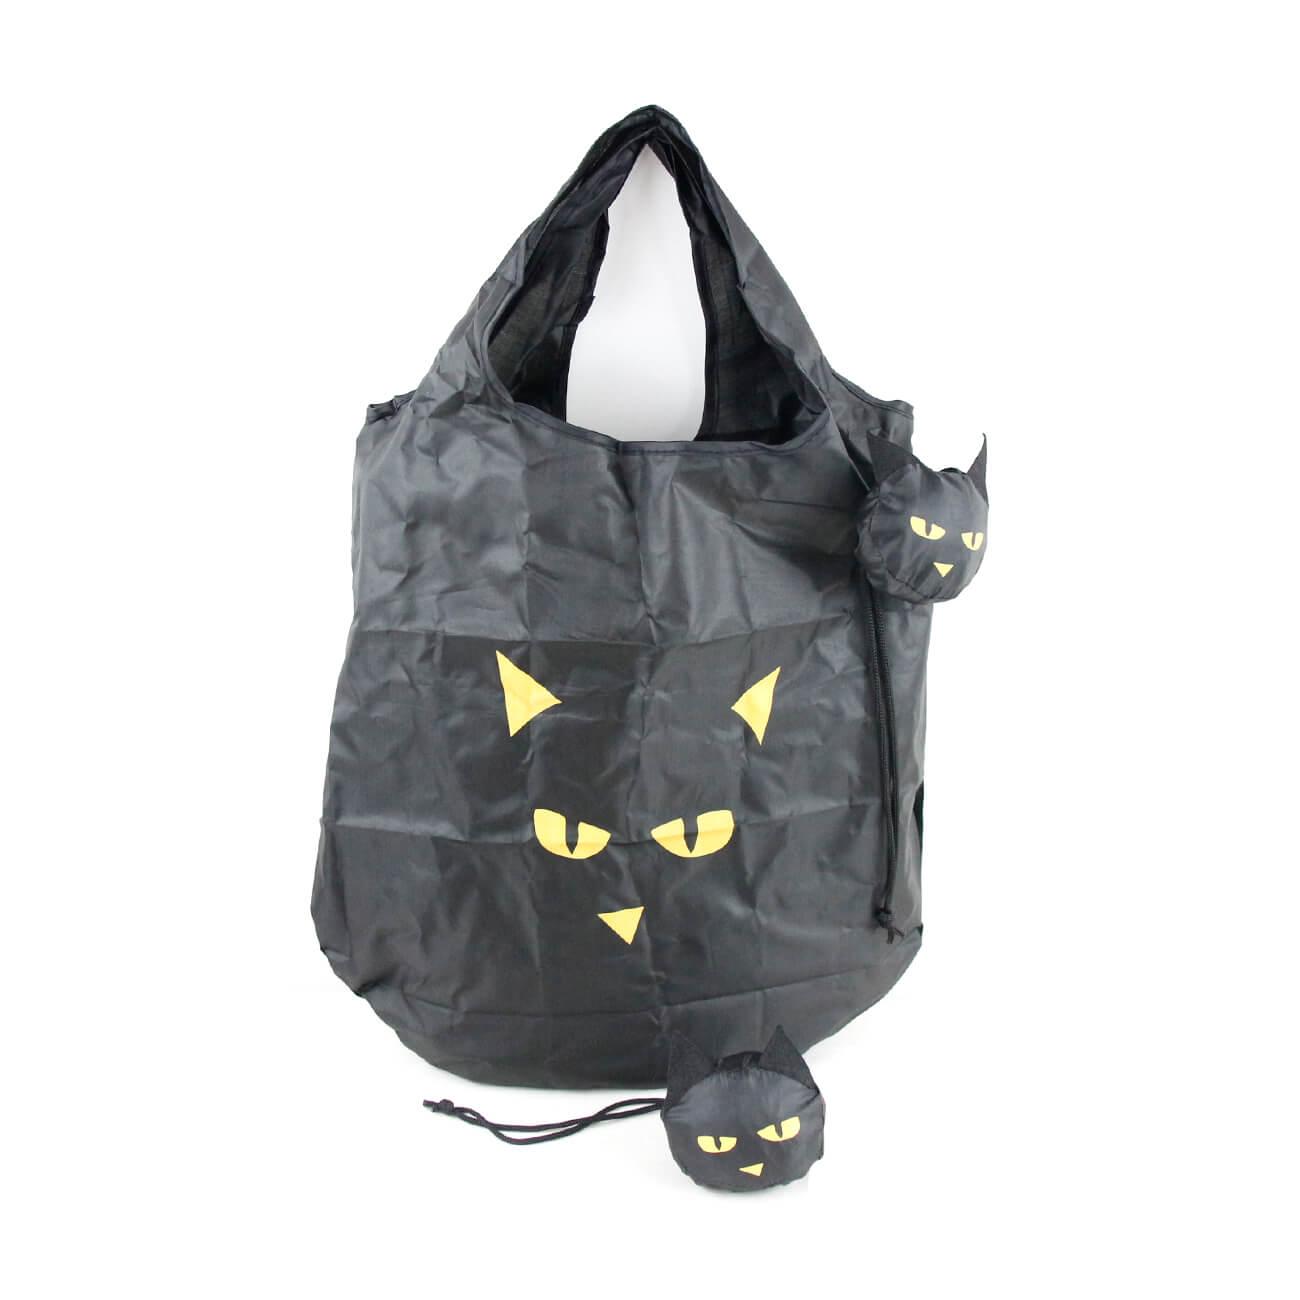 fd869864f Foldable Halloween Shopping Bag